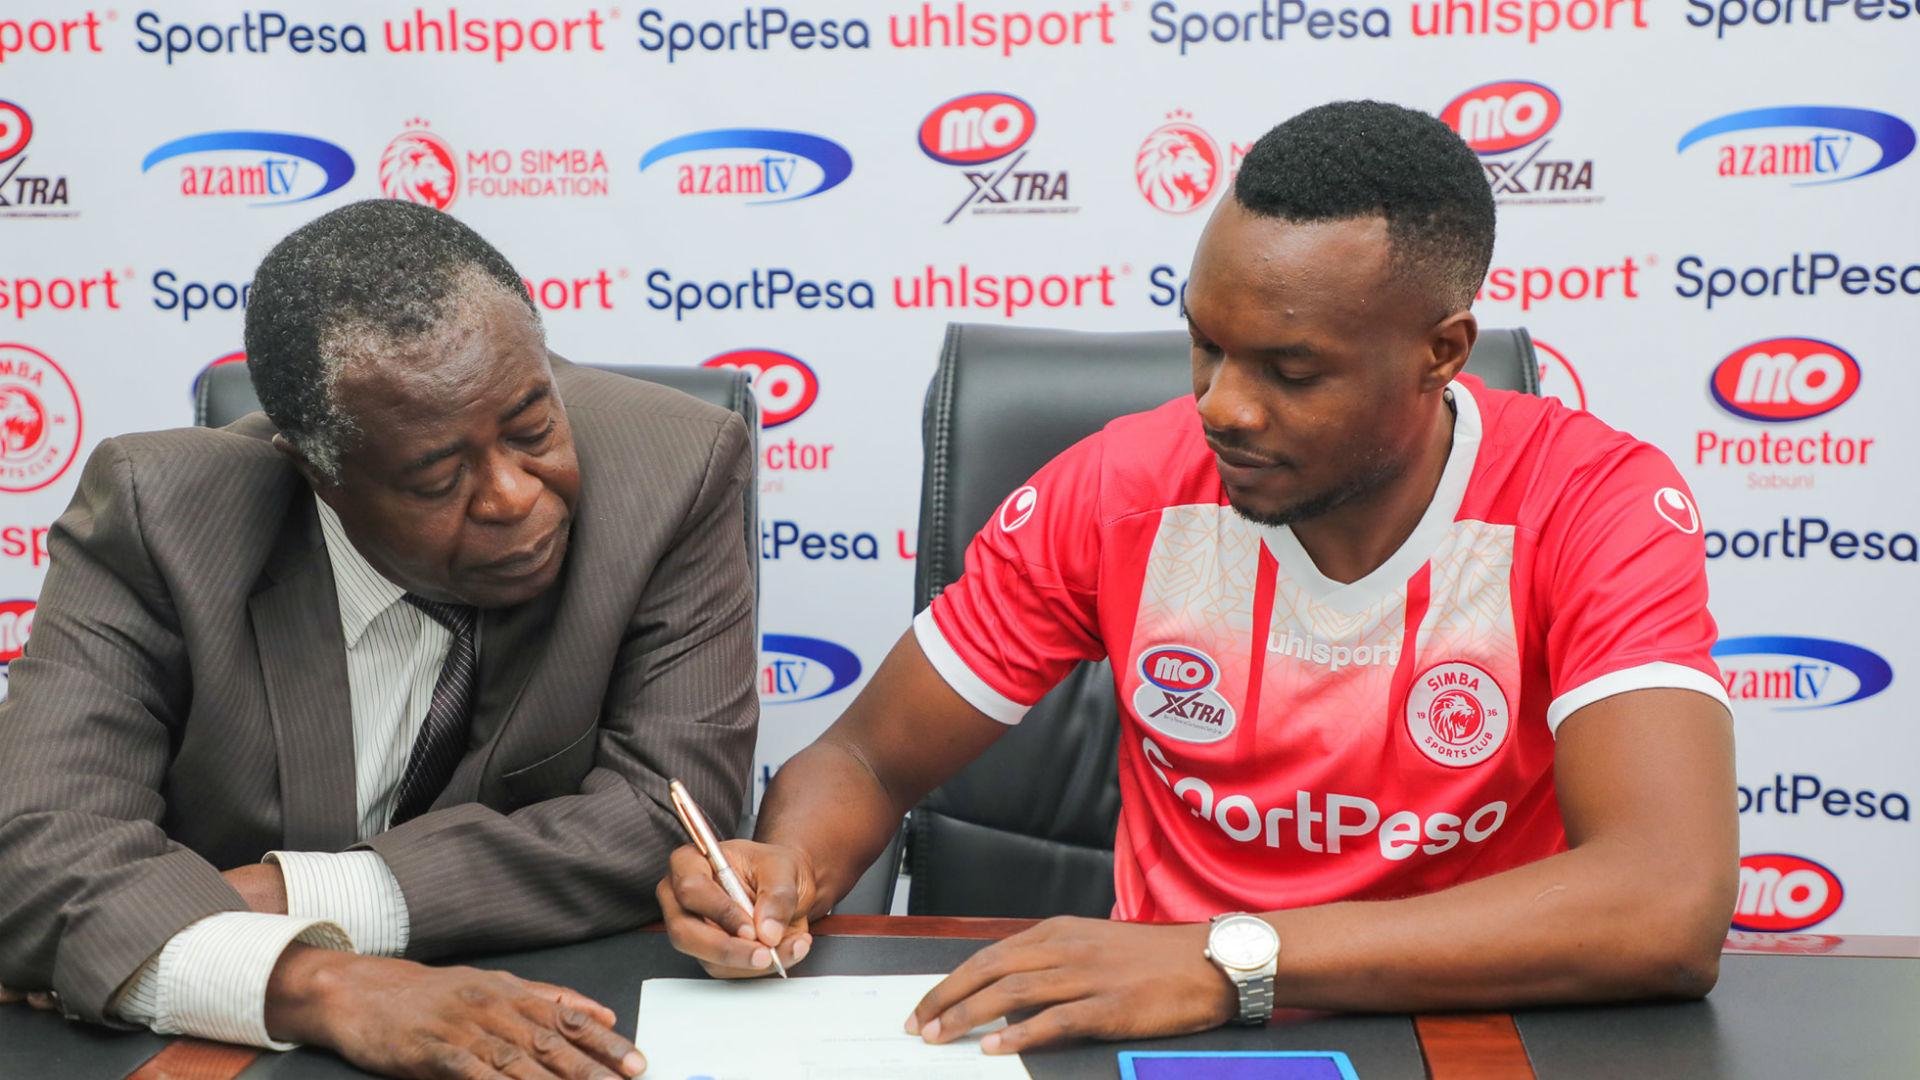 Simba betting uganda sport betting odds statistics covers